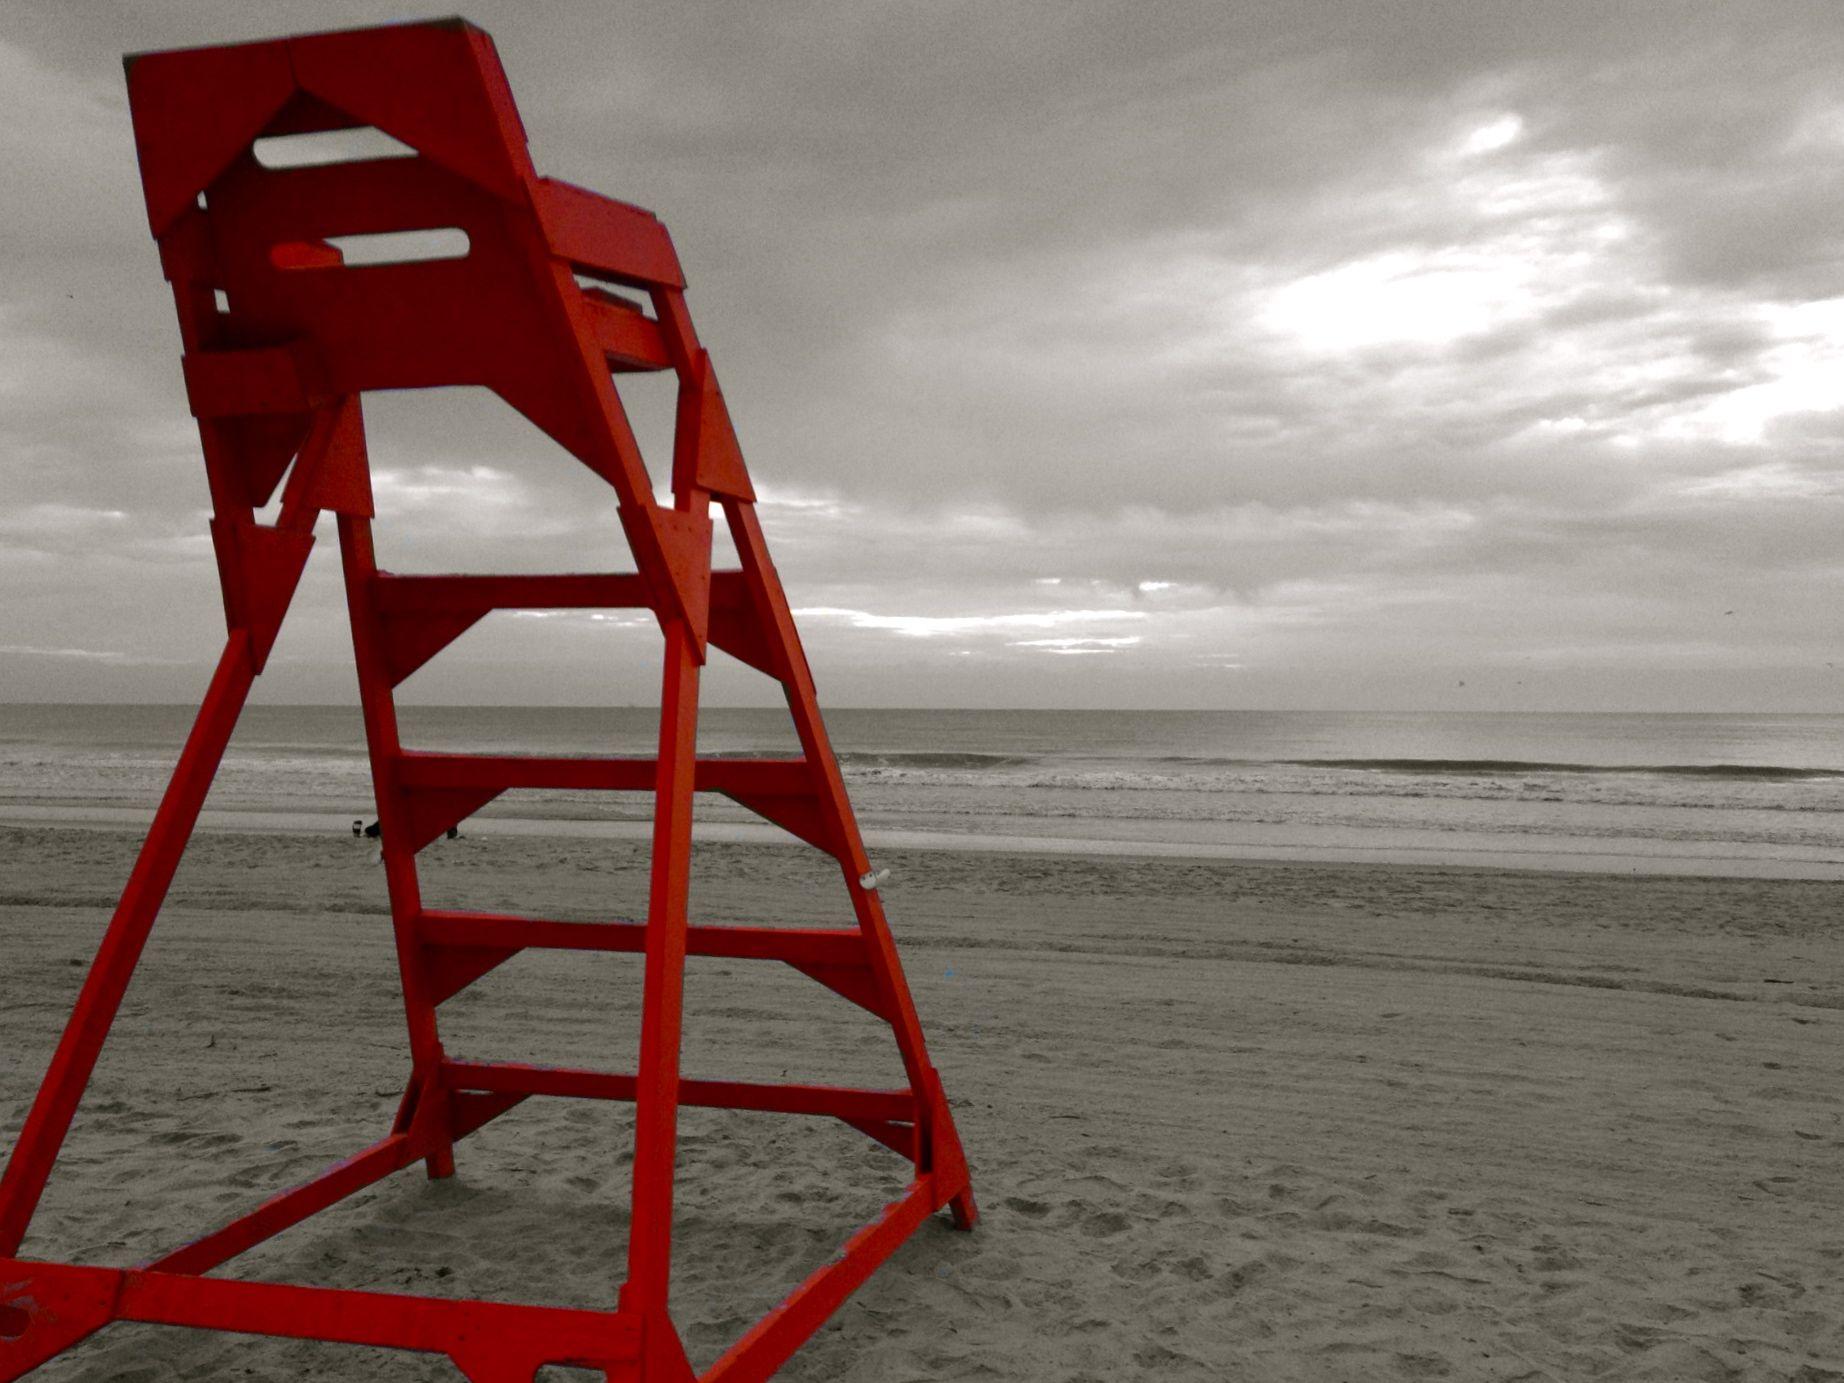 Lifeguard Chair Jacksonville Beach Fl Apron Strings For